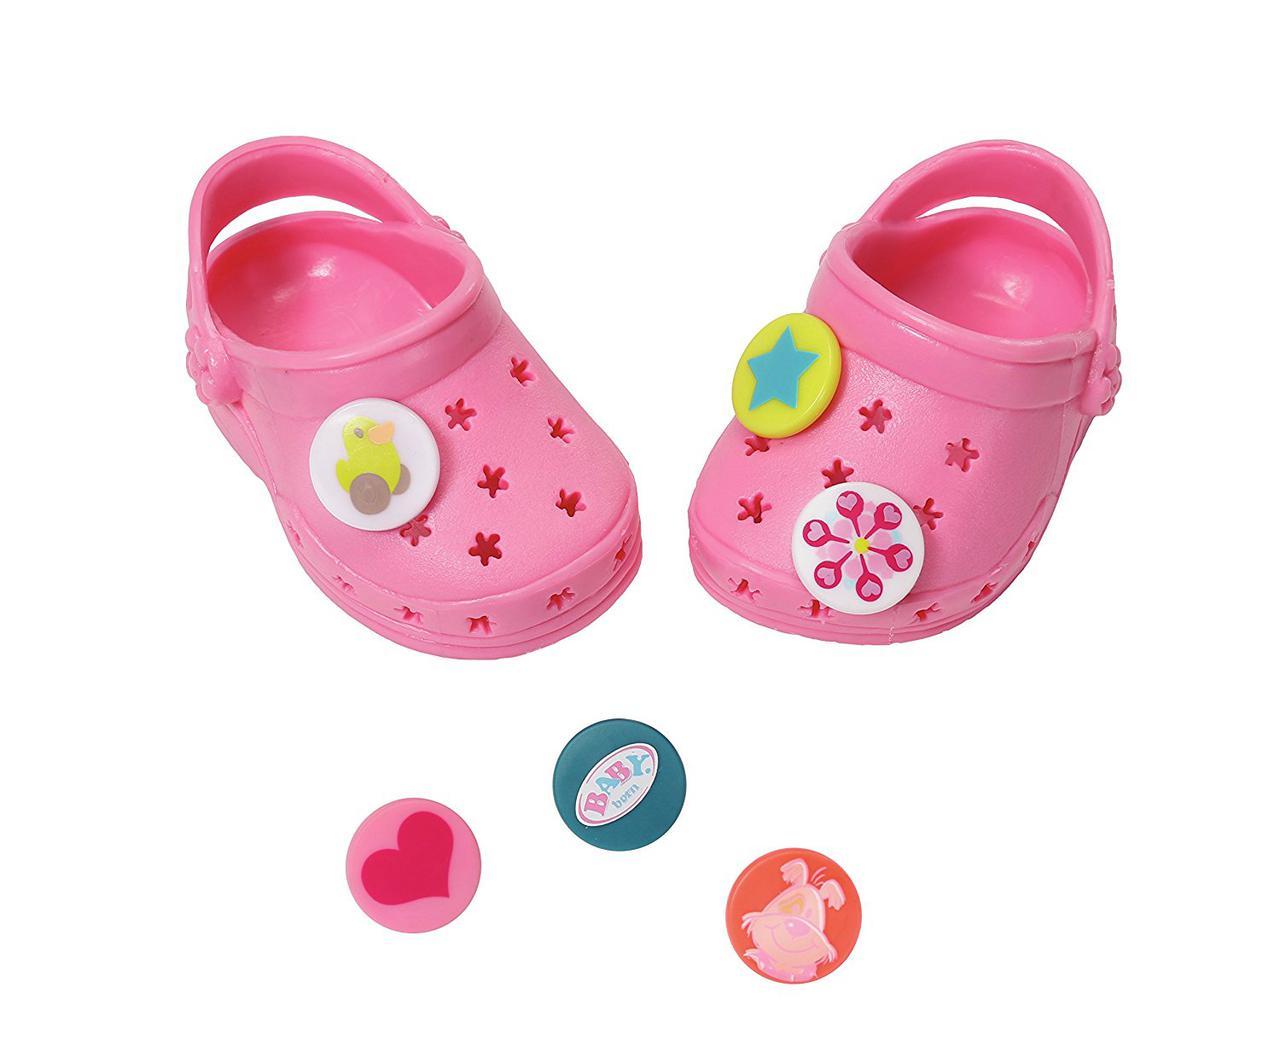 Обувь для кукол Беби Борн сандали кроксы розовые Baby Born Zapf Creation 822067